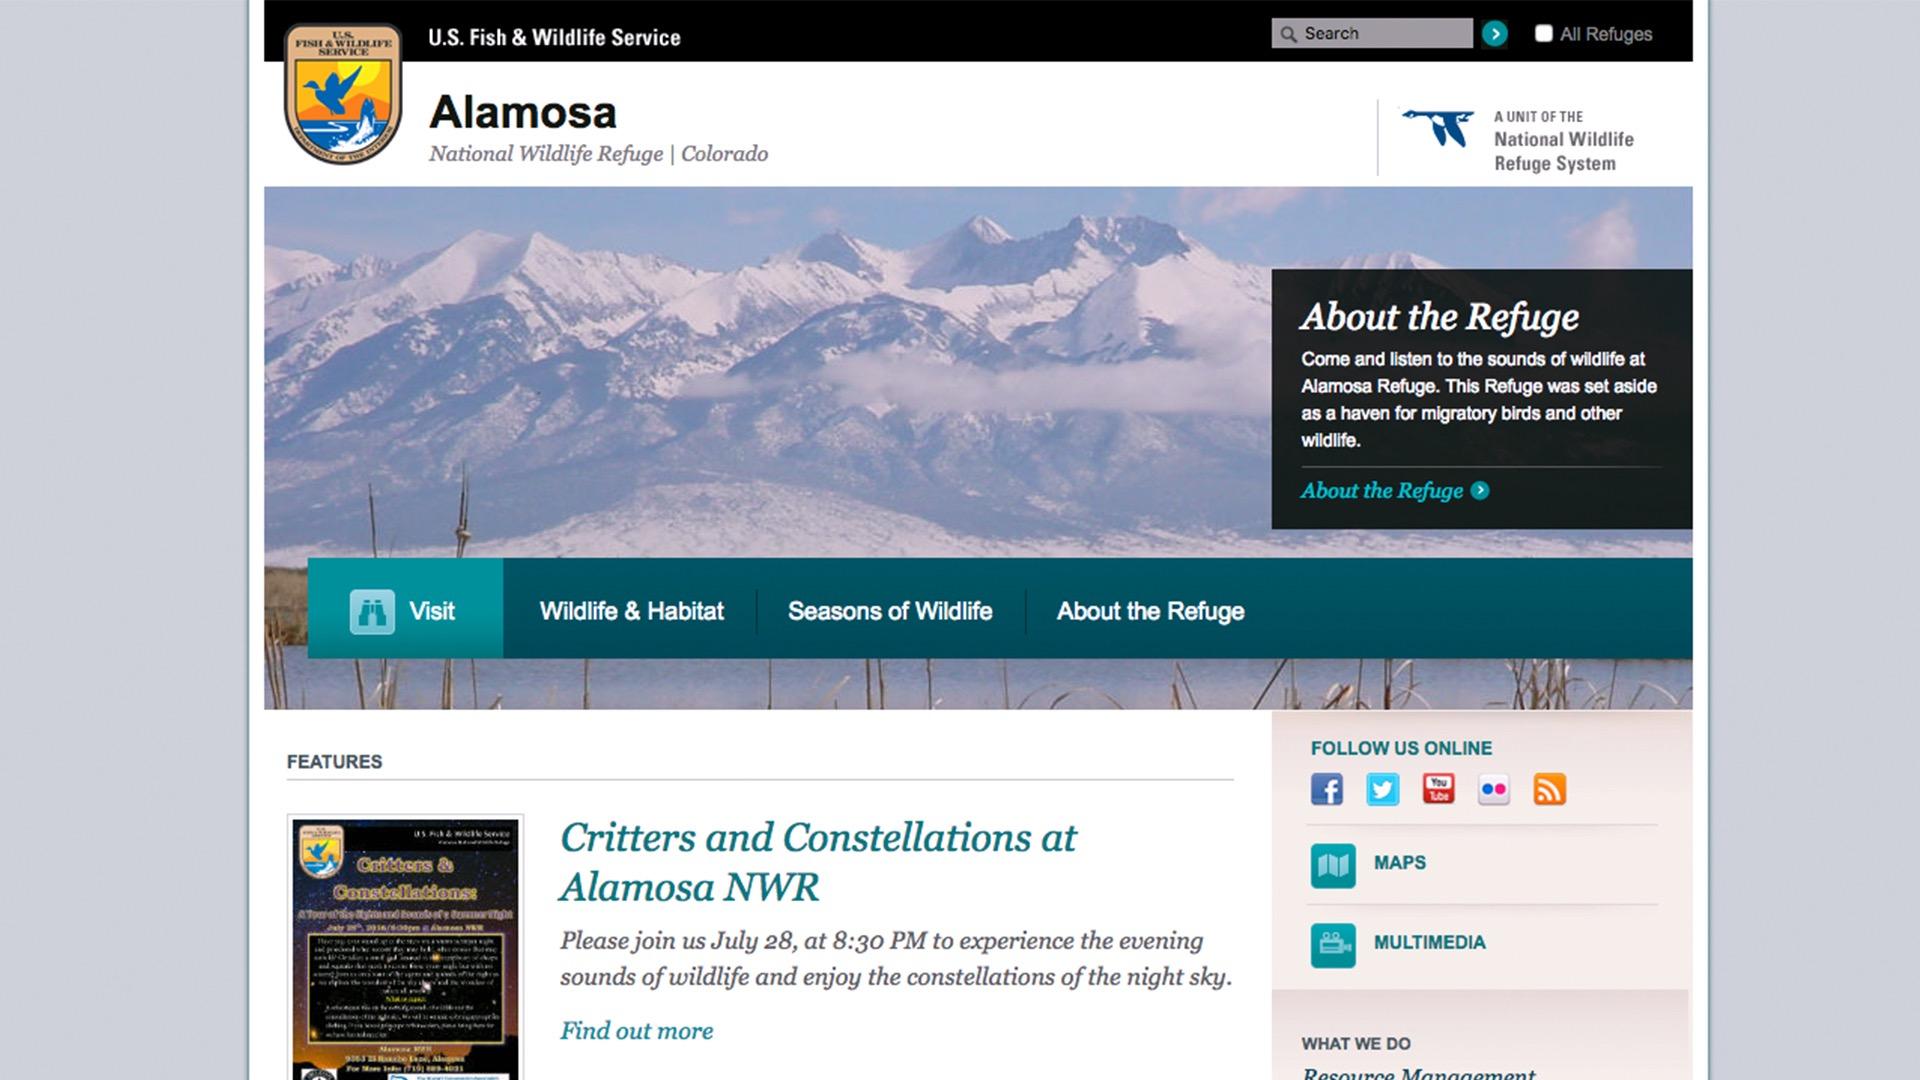 Alamosa Wildlife Refuge website